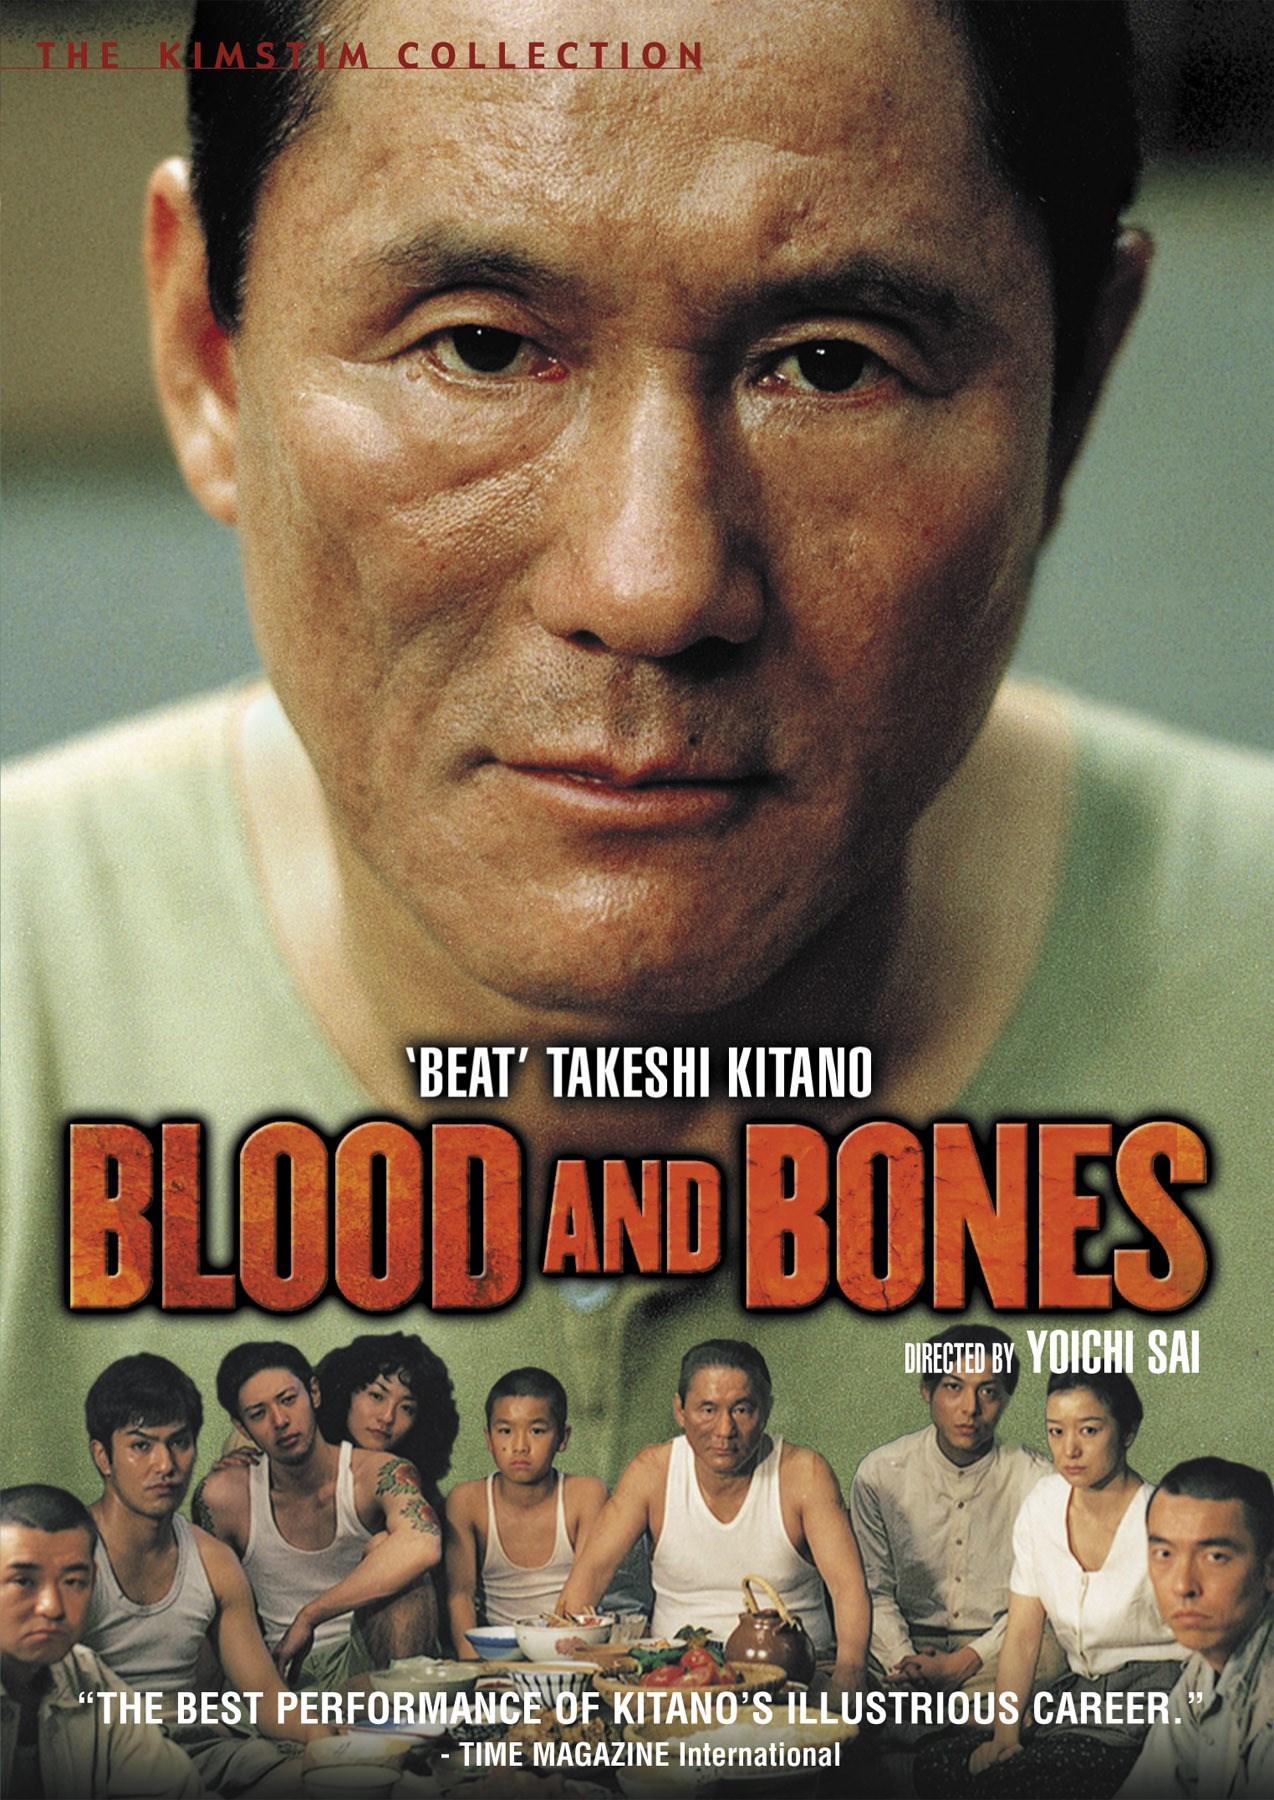 Subscene - Blood and Bones (Chi to hone) English subtitle